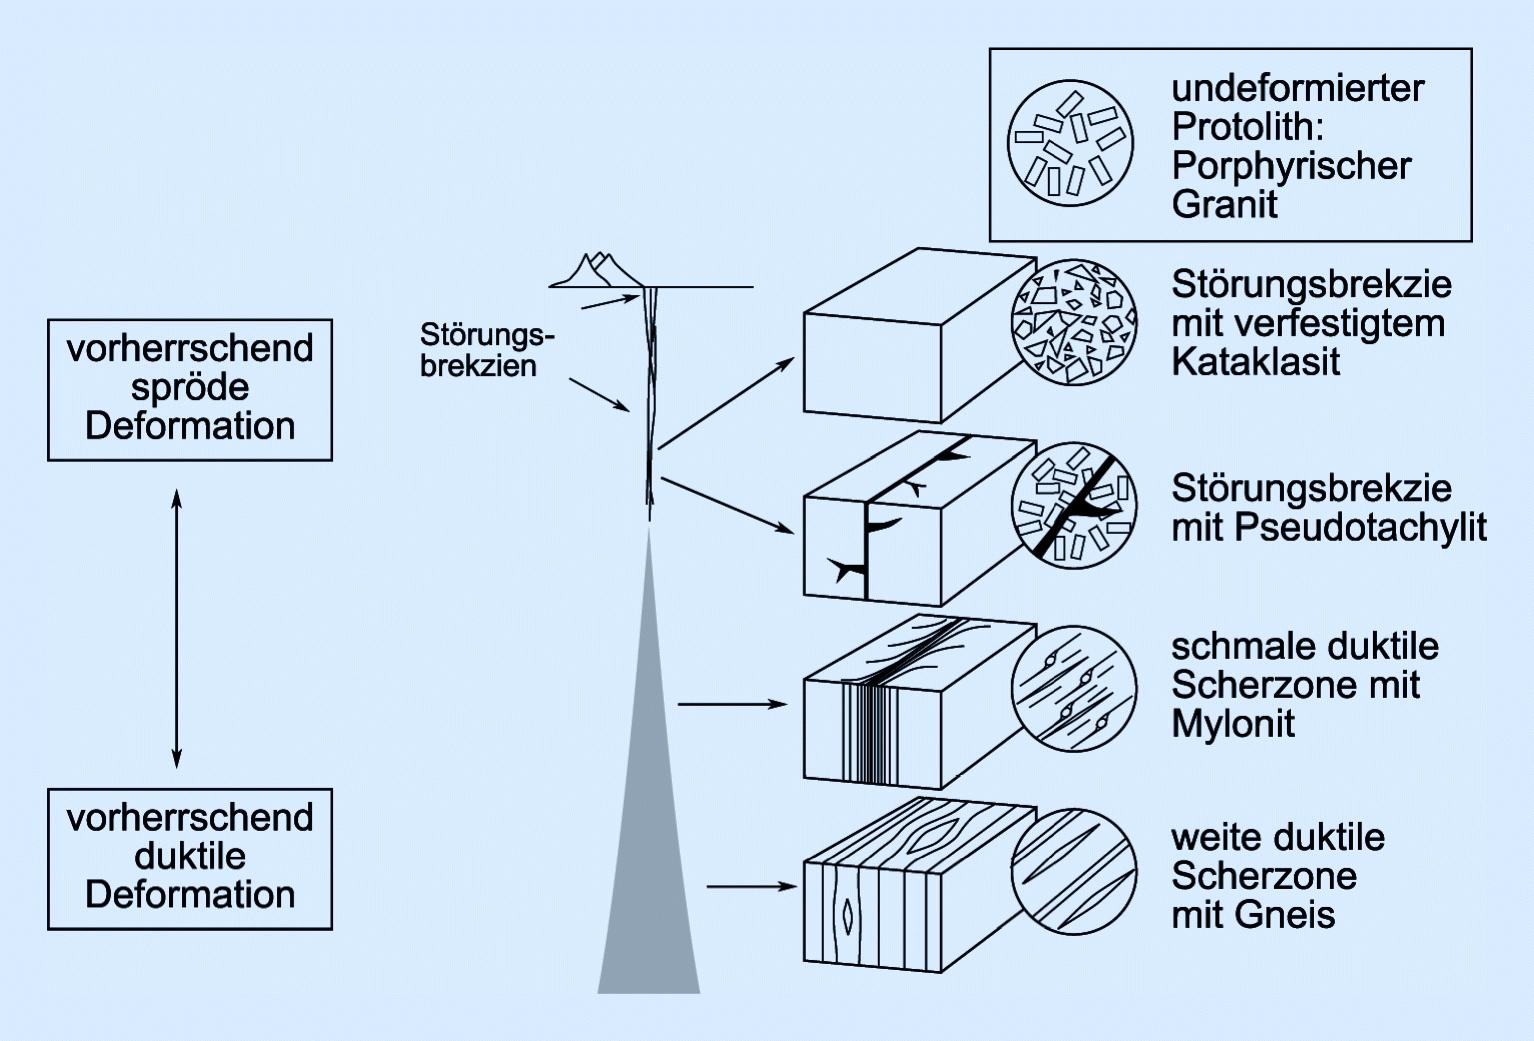 tektonik und beckenbildung springerlink. Black Bedroom Furniture Sets. Home Design Ideas